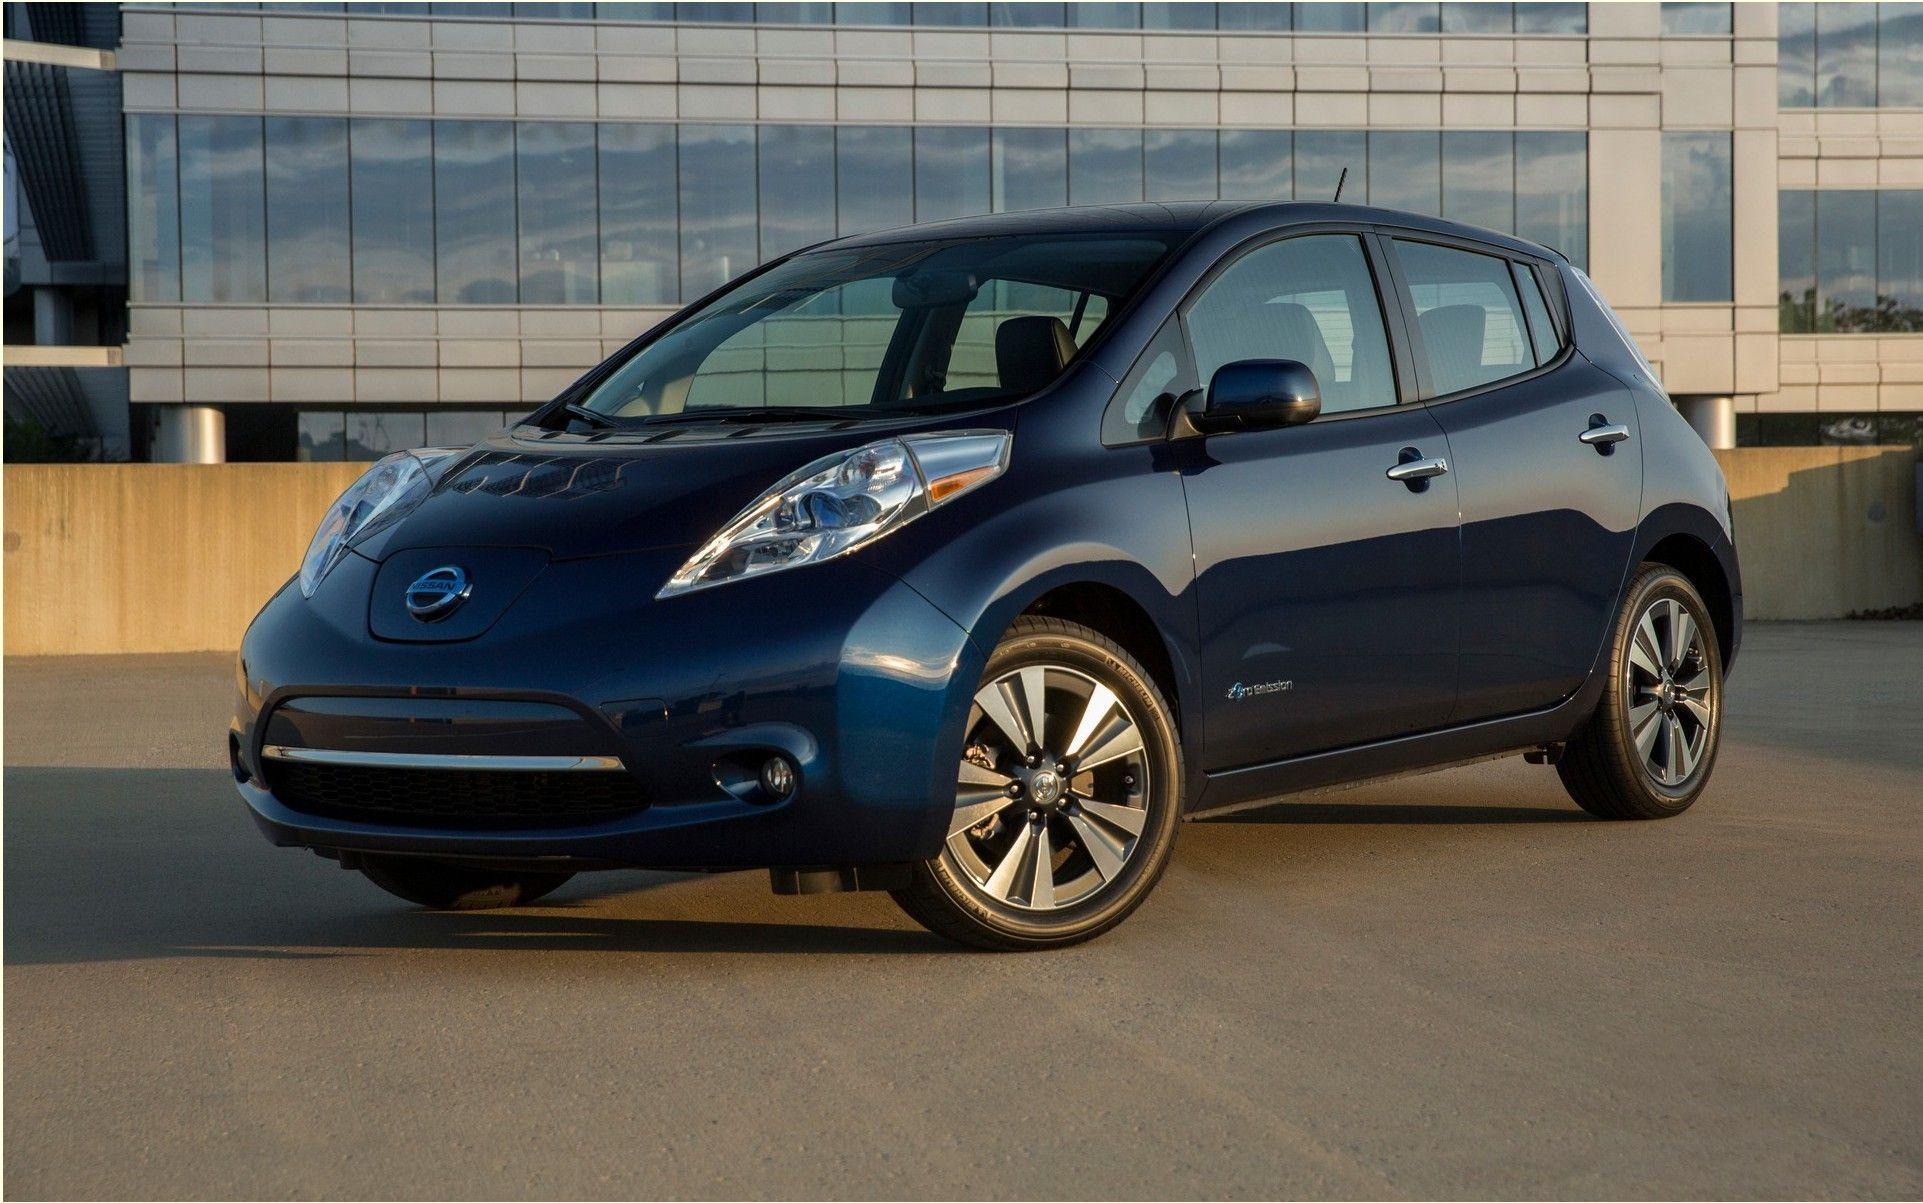 Best 25 hybrid vehicle ideas on pinterest off road cars best 25 hybrid vehicle ideas on pinterest off road cars hybrids and electric cars and future electric cars buycottarizona